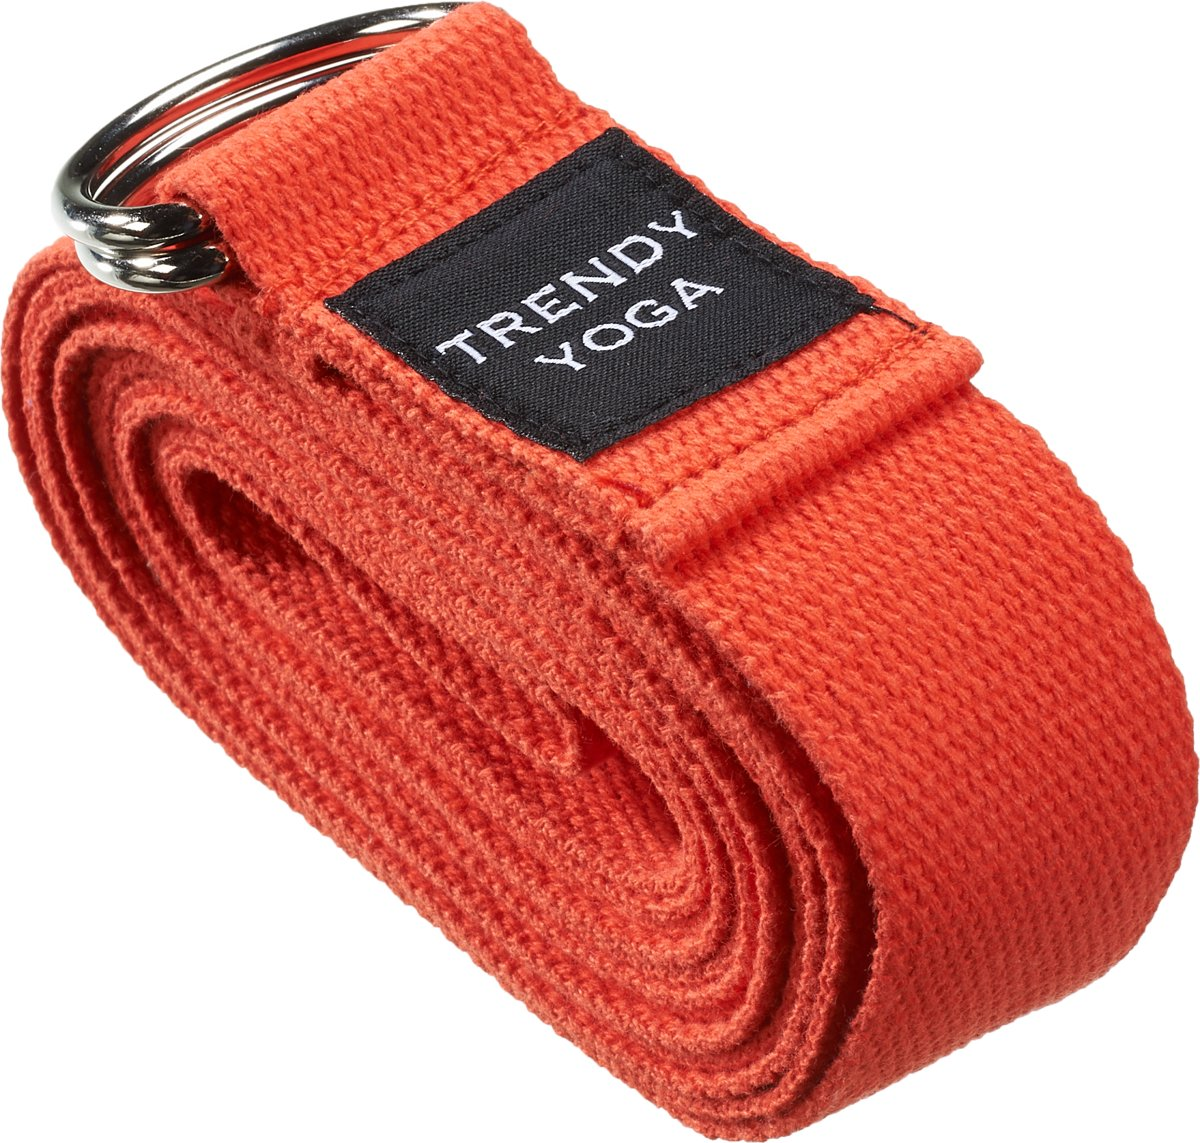 Trendy Sport Yoga riem - Yogariem - Yoga belt - 190 cm lang - 4 cm breed - 2 mm dik - Rood kopen